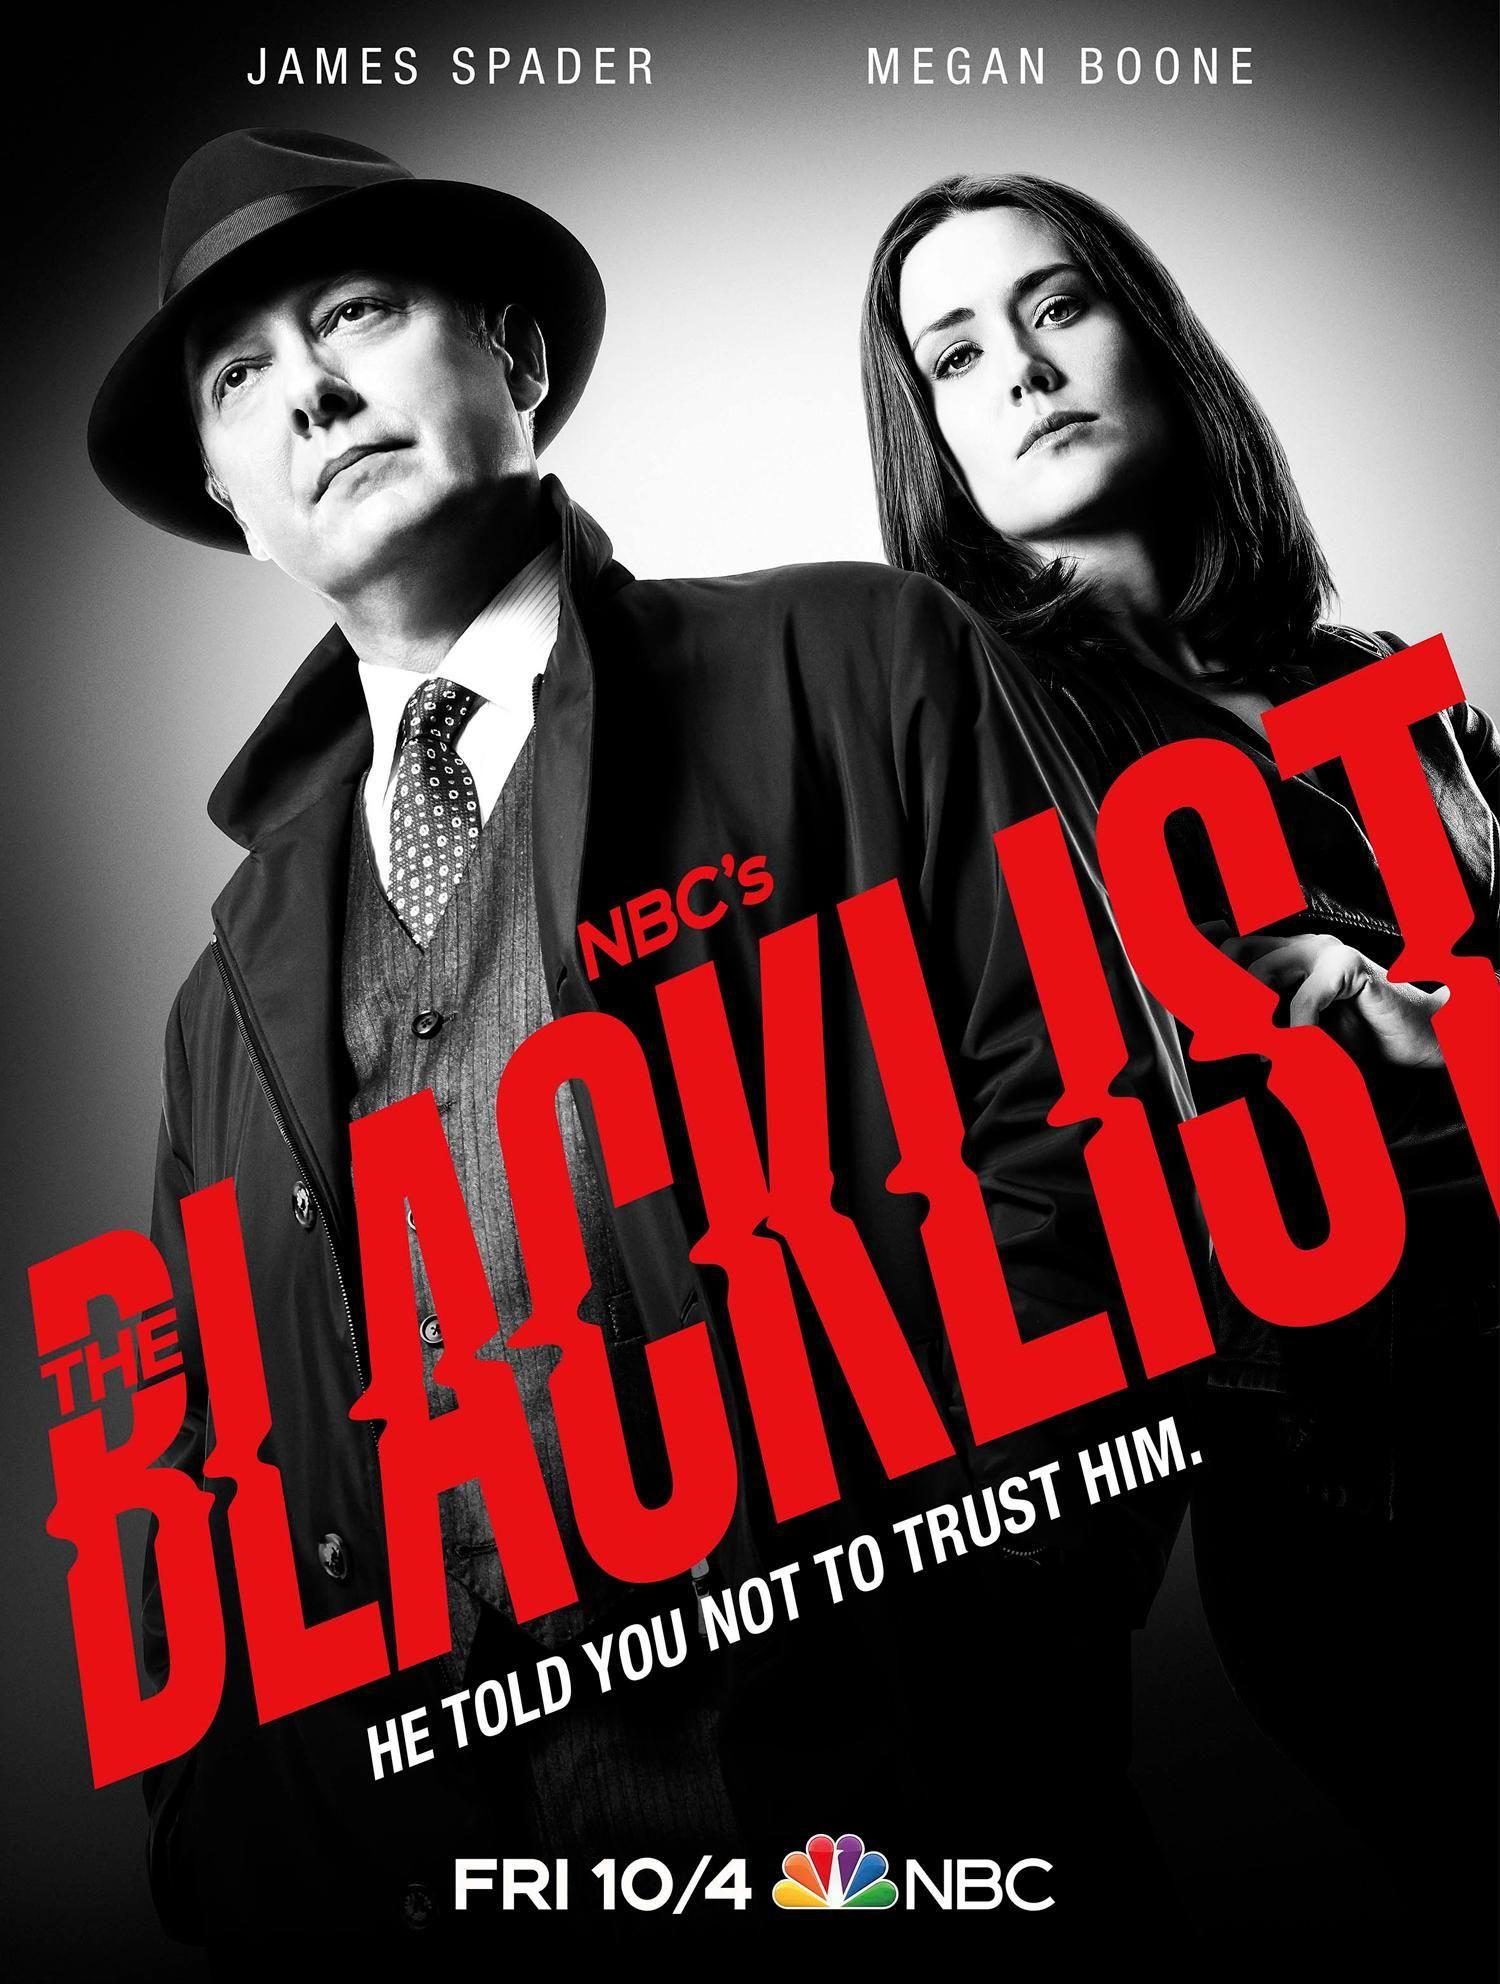 Theblacklist Season 7 Promo James Spader The Blacklist Season 7